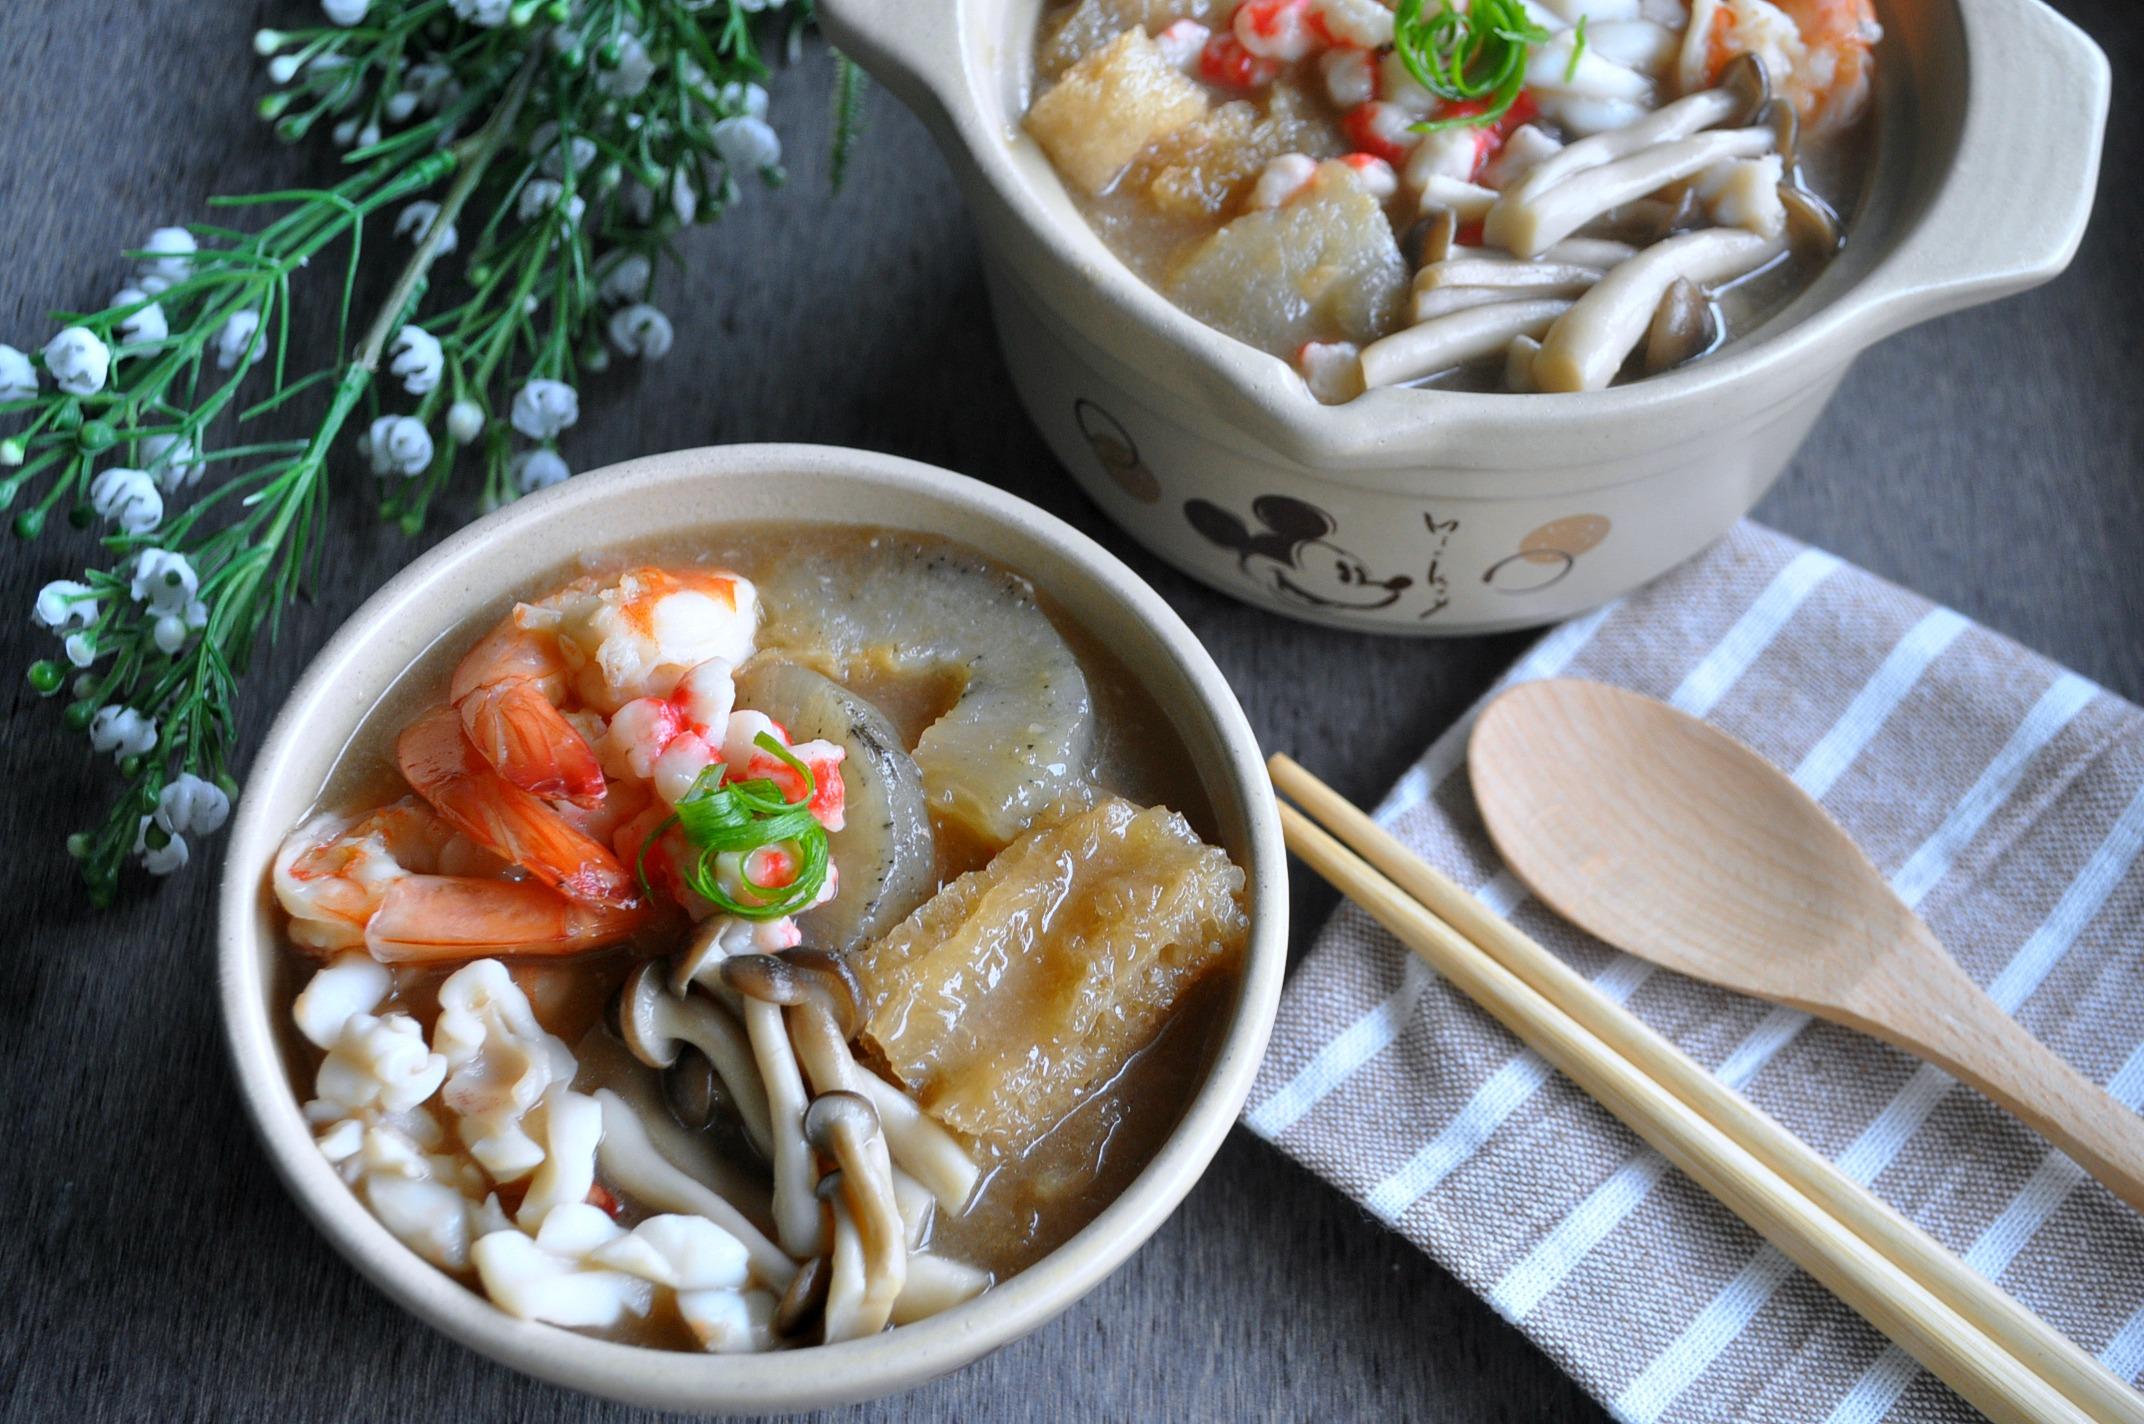 Fish Maw & Sea Cucumber Seafood Broth 什锦鱼鳔海参羹 – Eat What ...